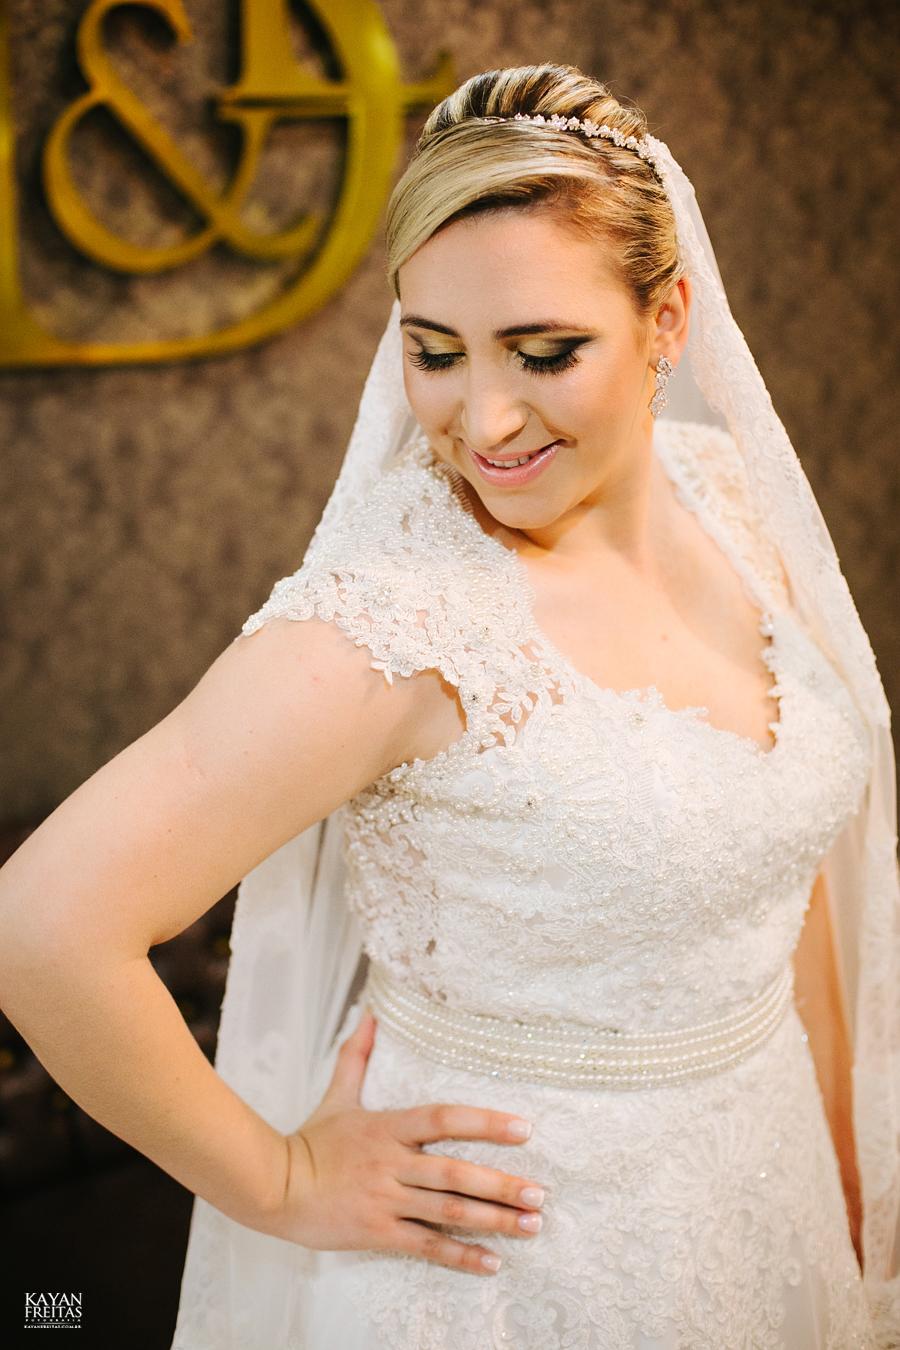 larissa-junior-casamento-0041 Larissa + Junior - Casamento em Biguaçu